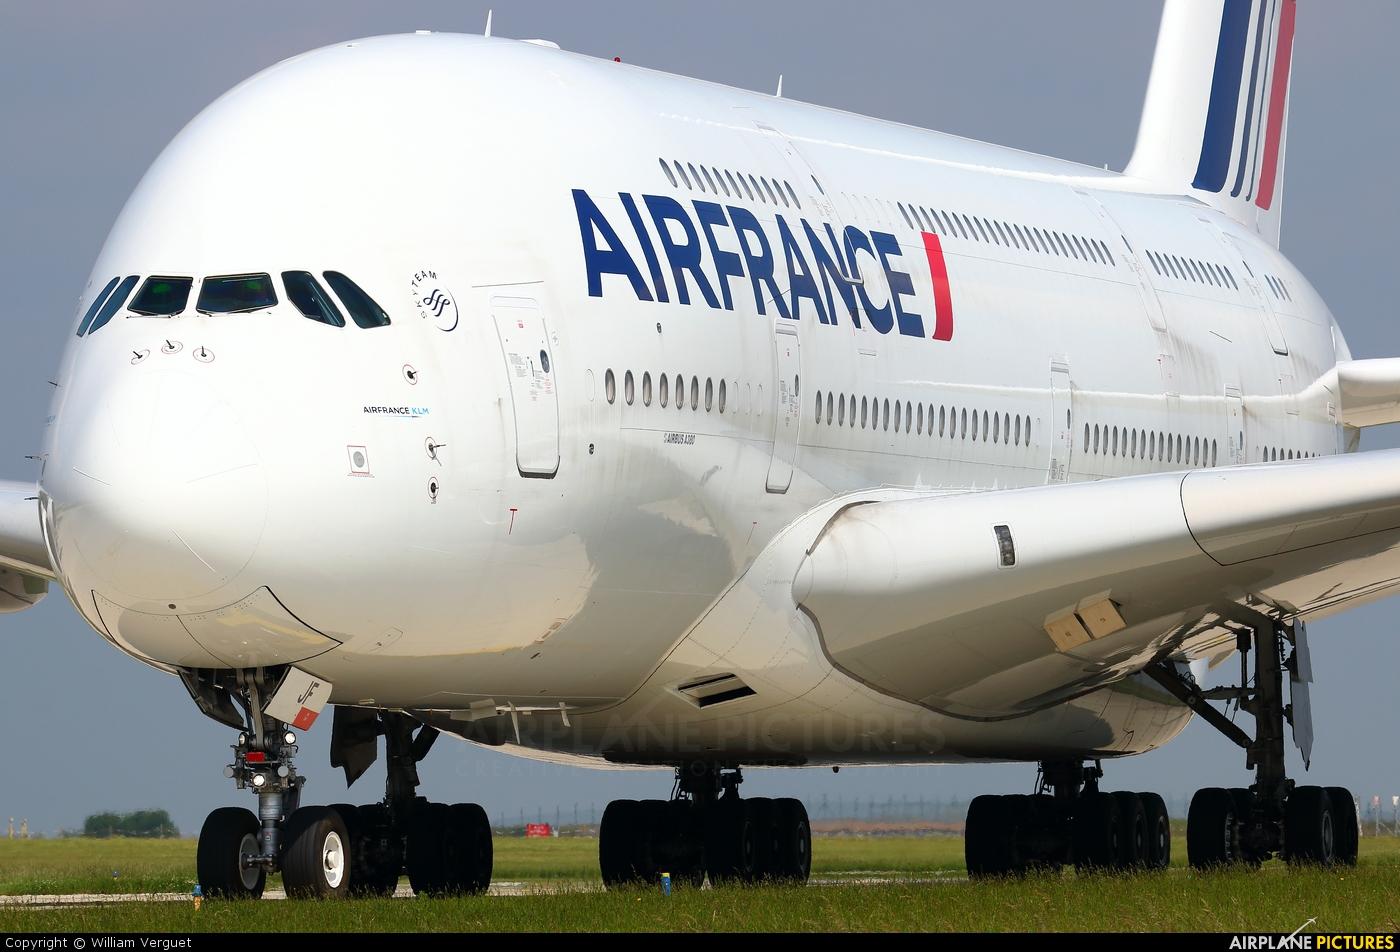 Air France F-HPJF aircraft at Paris - Charles de Gaulle